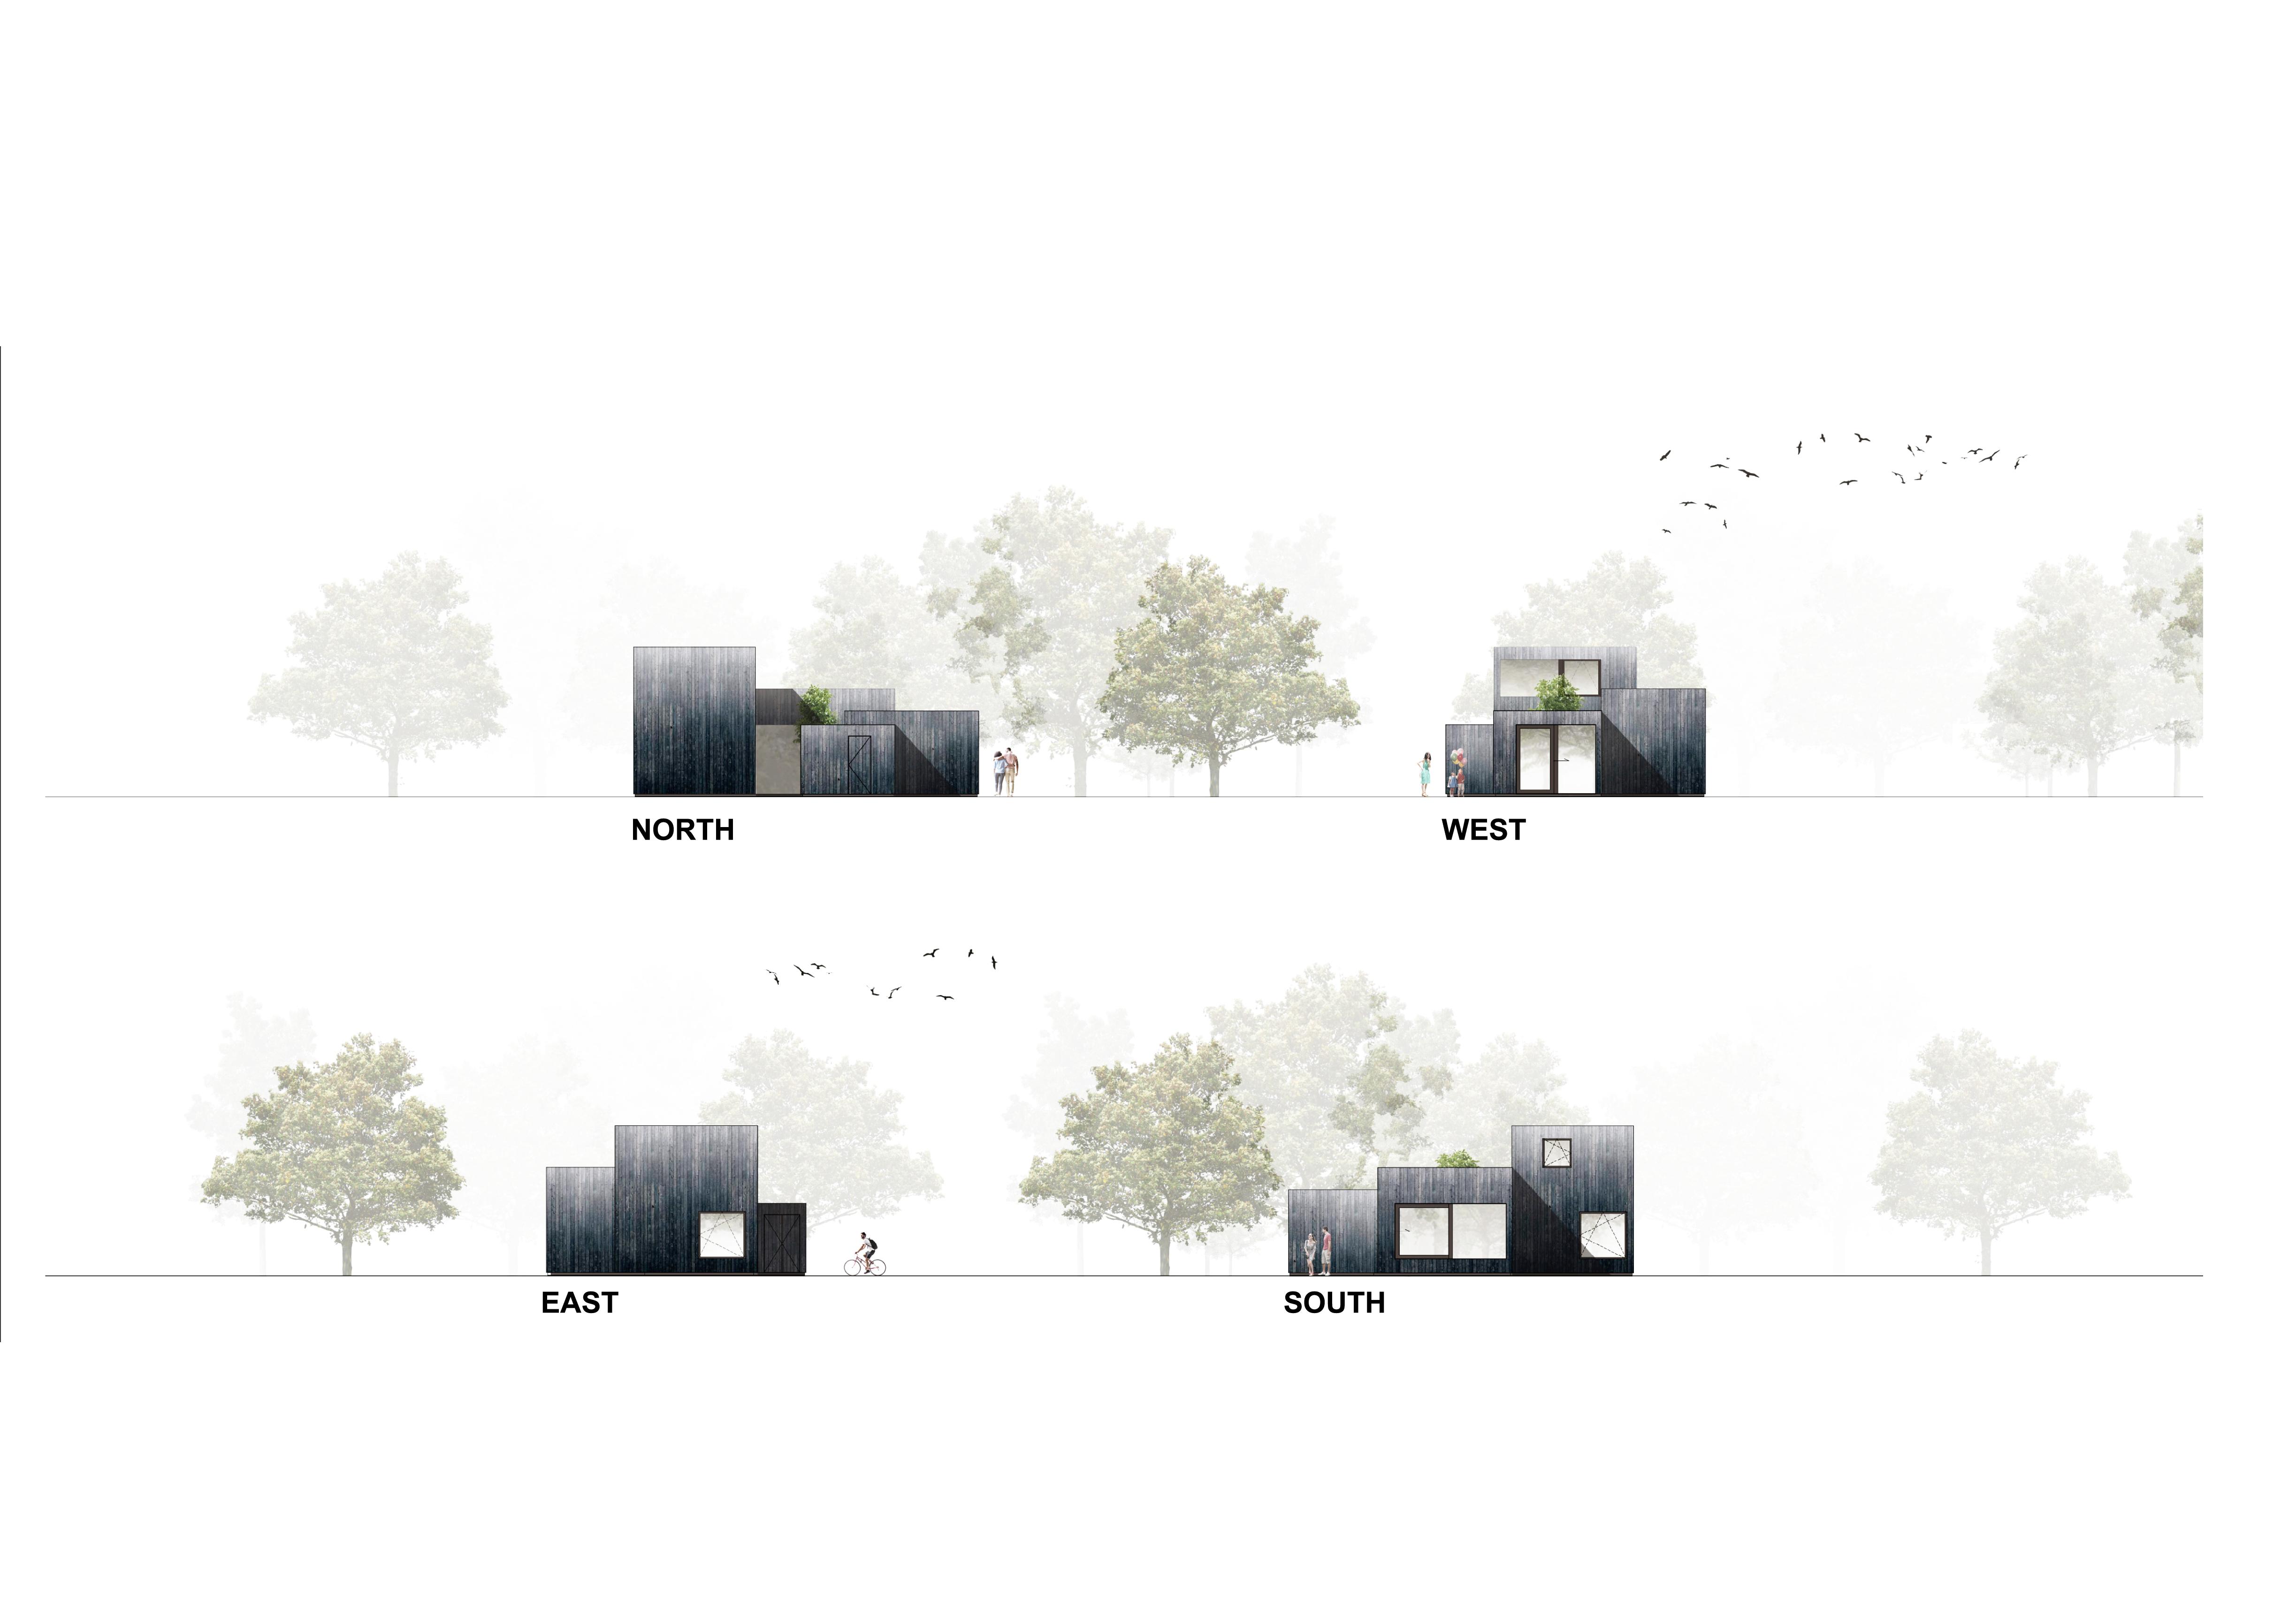 <p>Tiny Holiday Home in Vinkeveen door i29 interior architects en Chris Collaris</p>